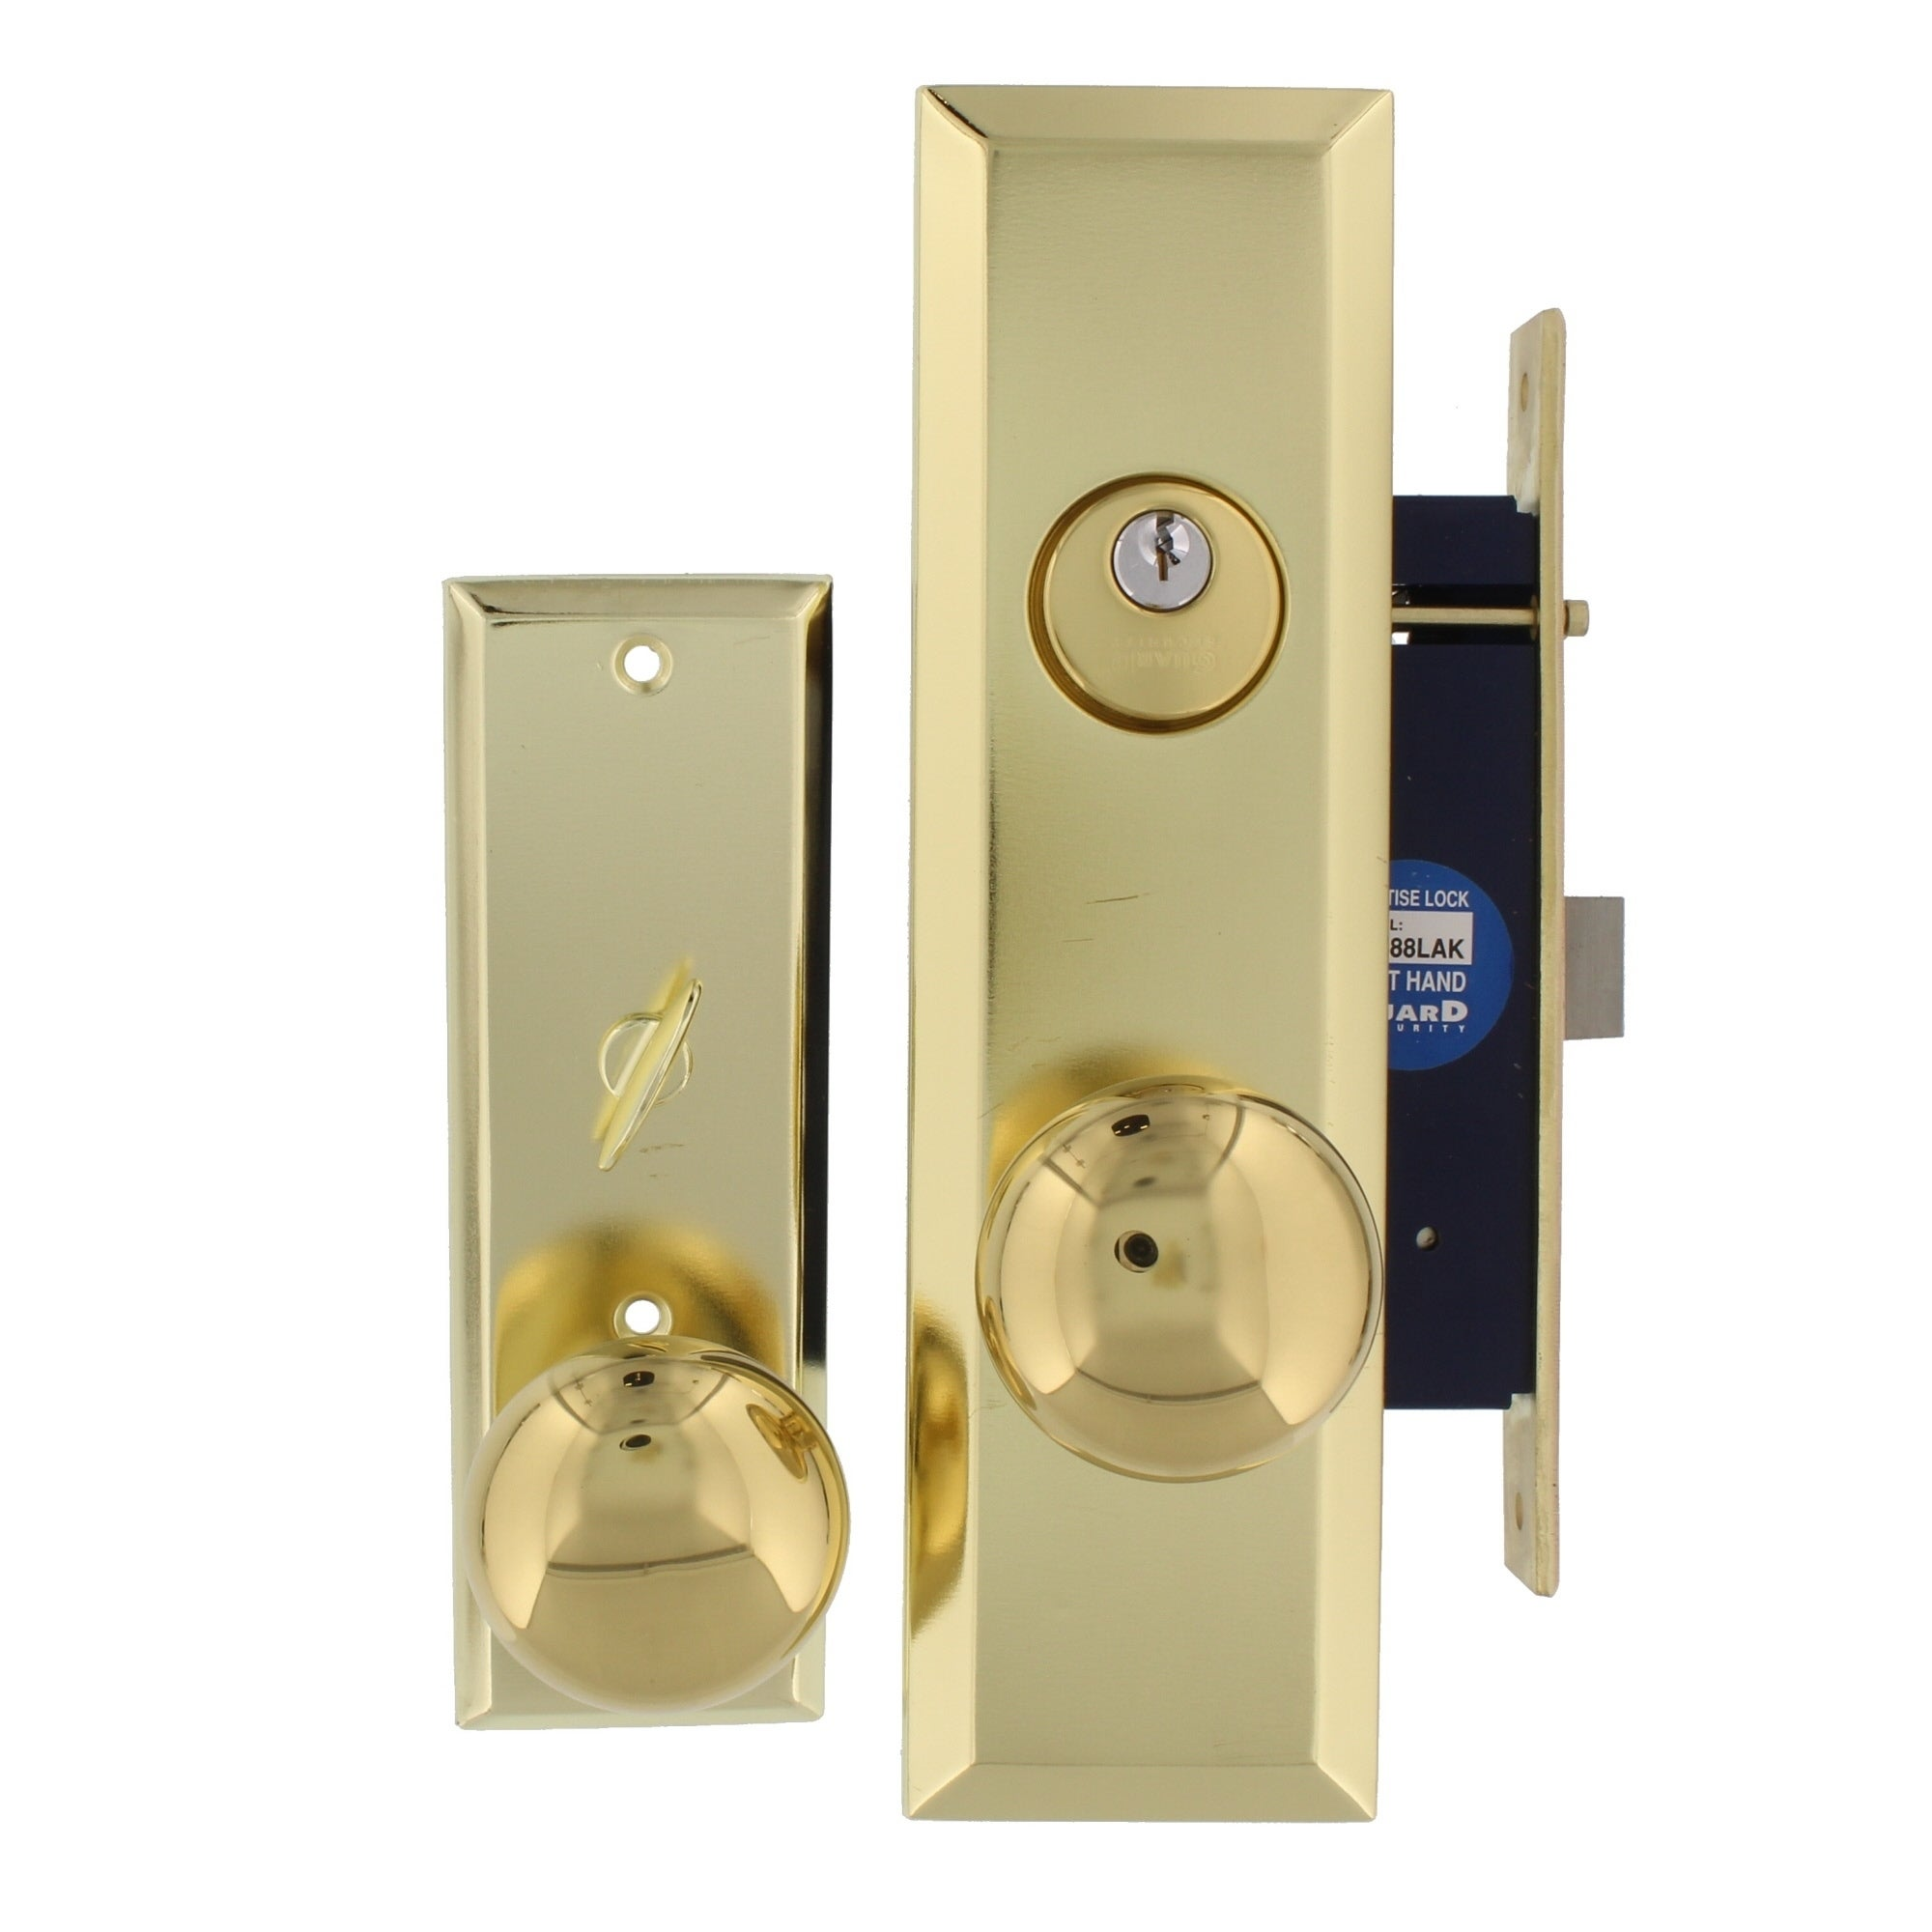 Gate House Glass /& Polishd Brass Mortise Interior Keyed Locking Door Knob